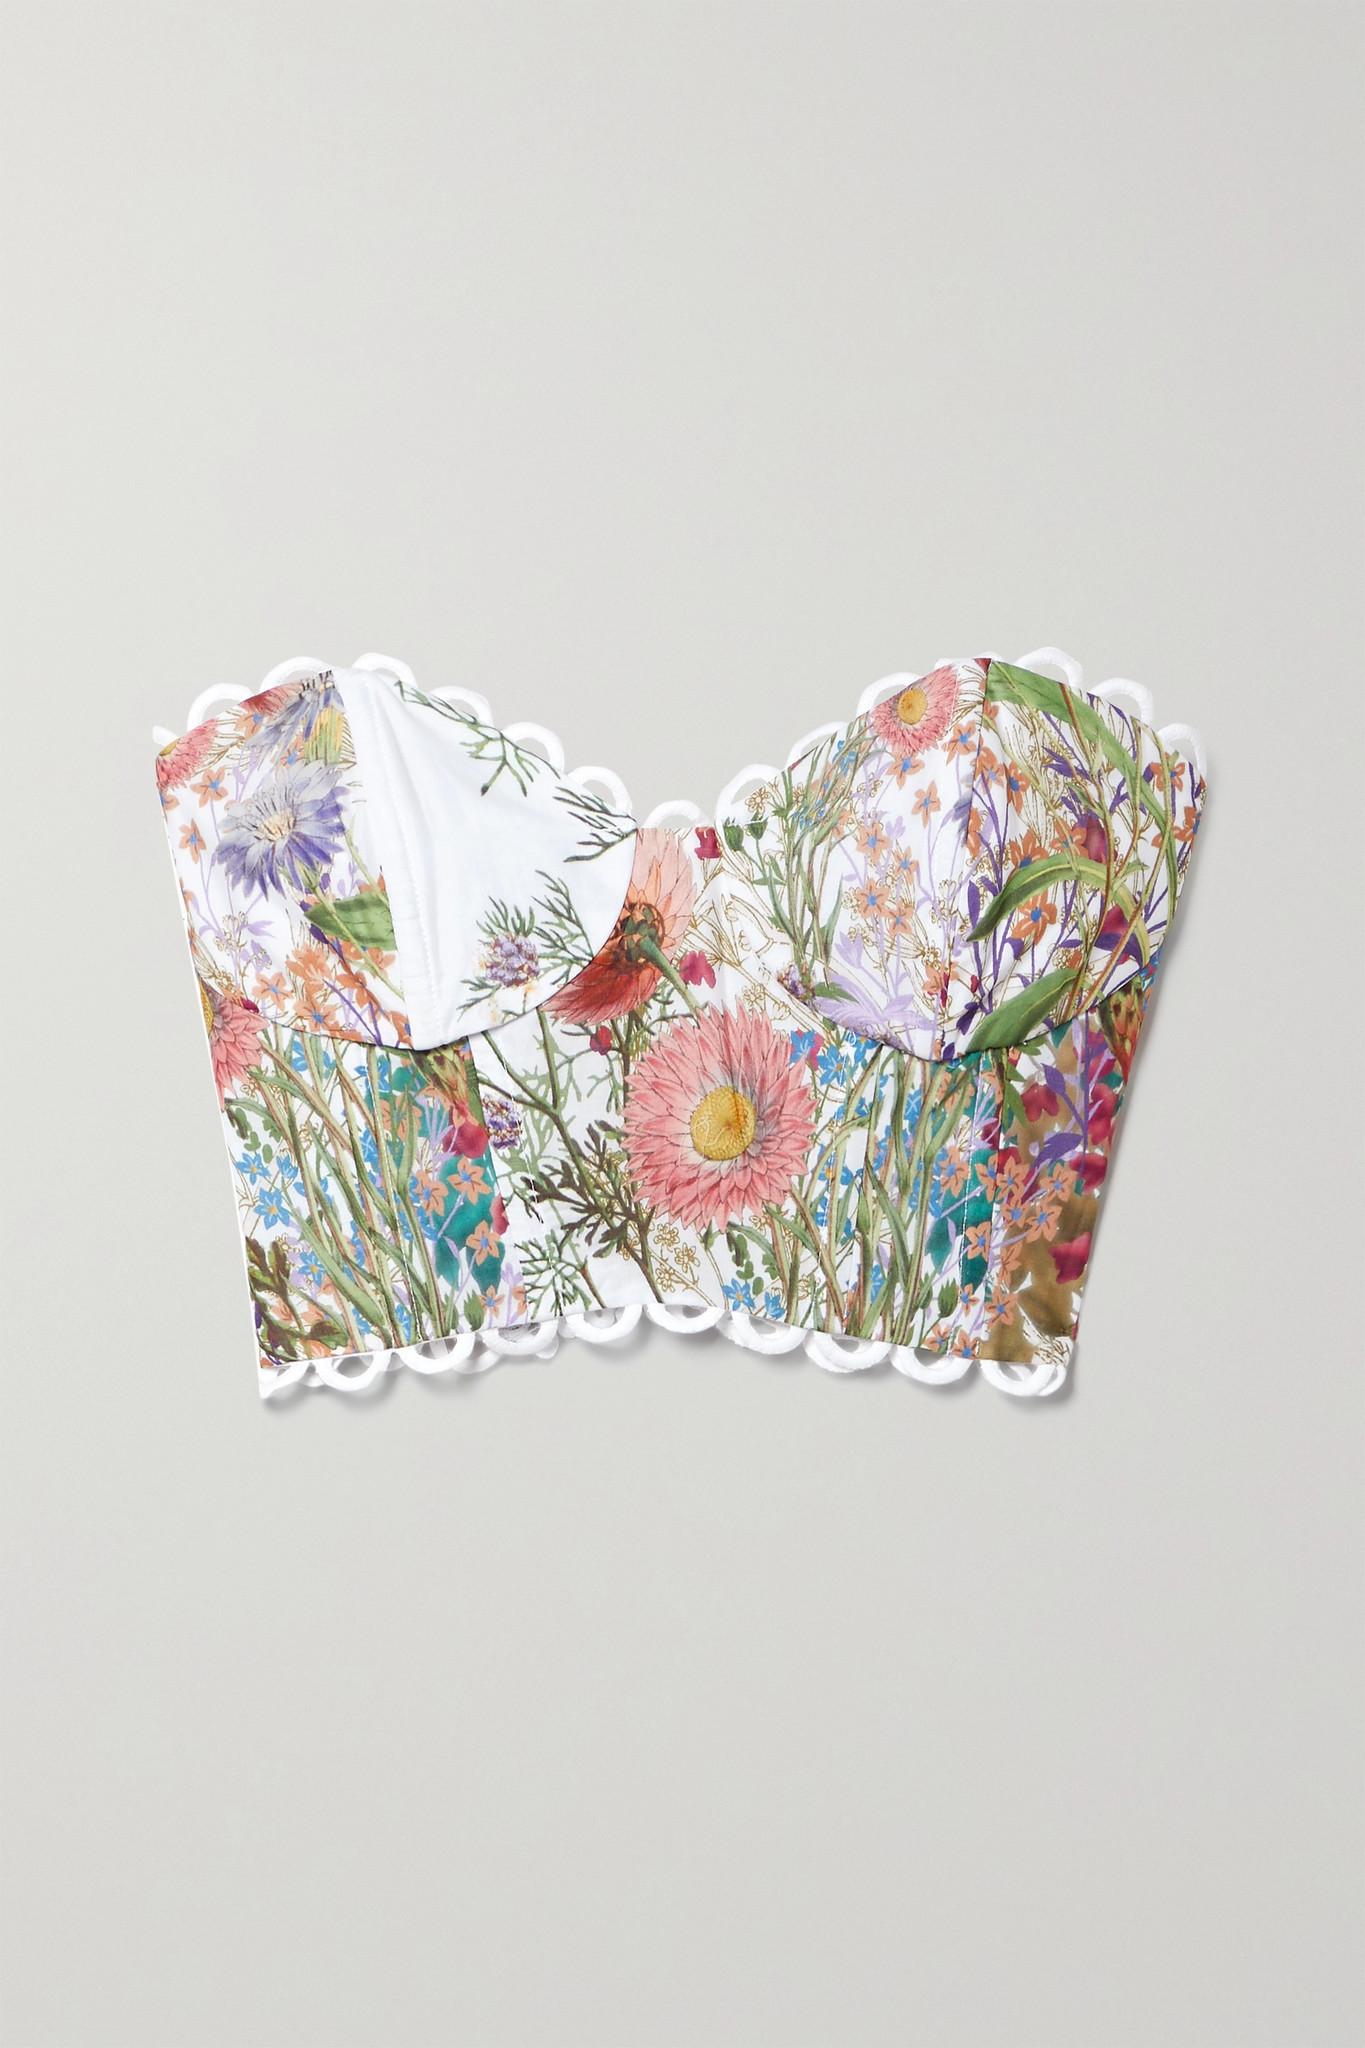 CHARO RUIZ - Lita 环孔缝边花卉印花纯棉抹胸上衣 - 白色 - small